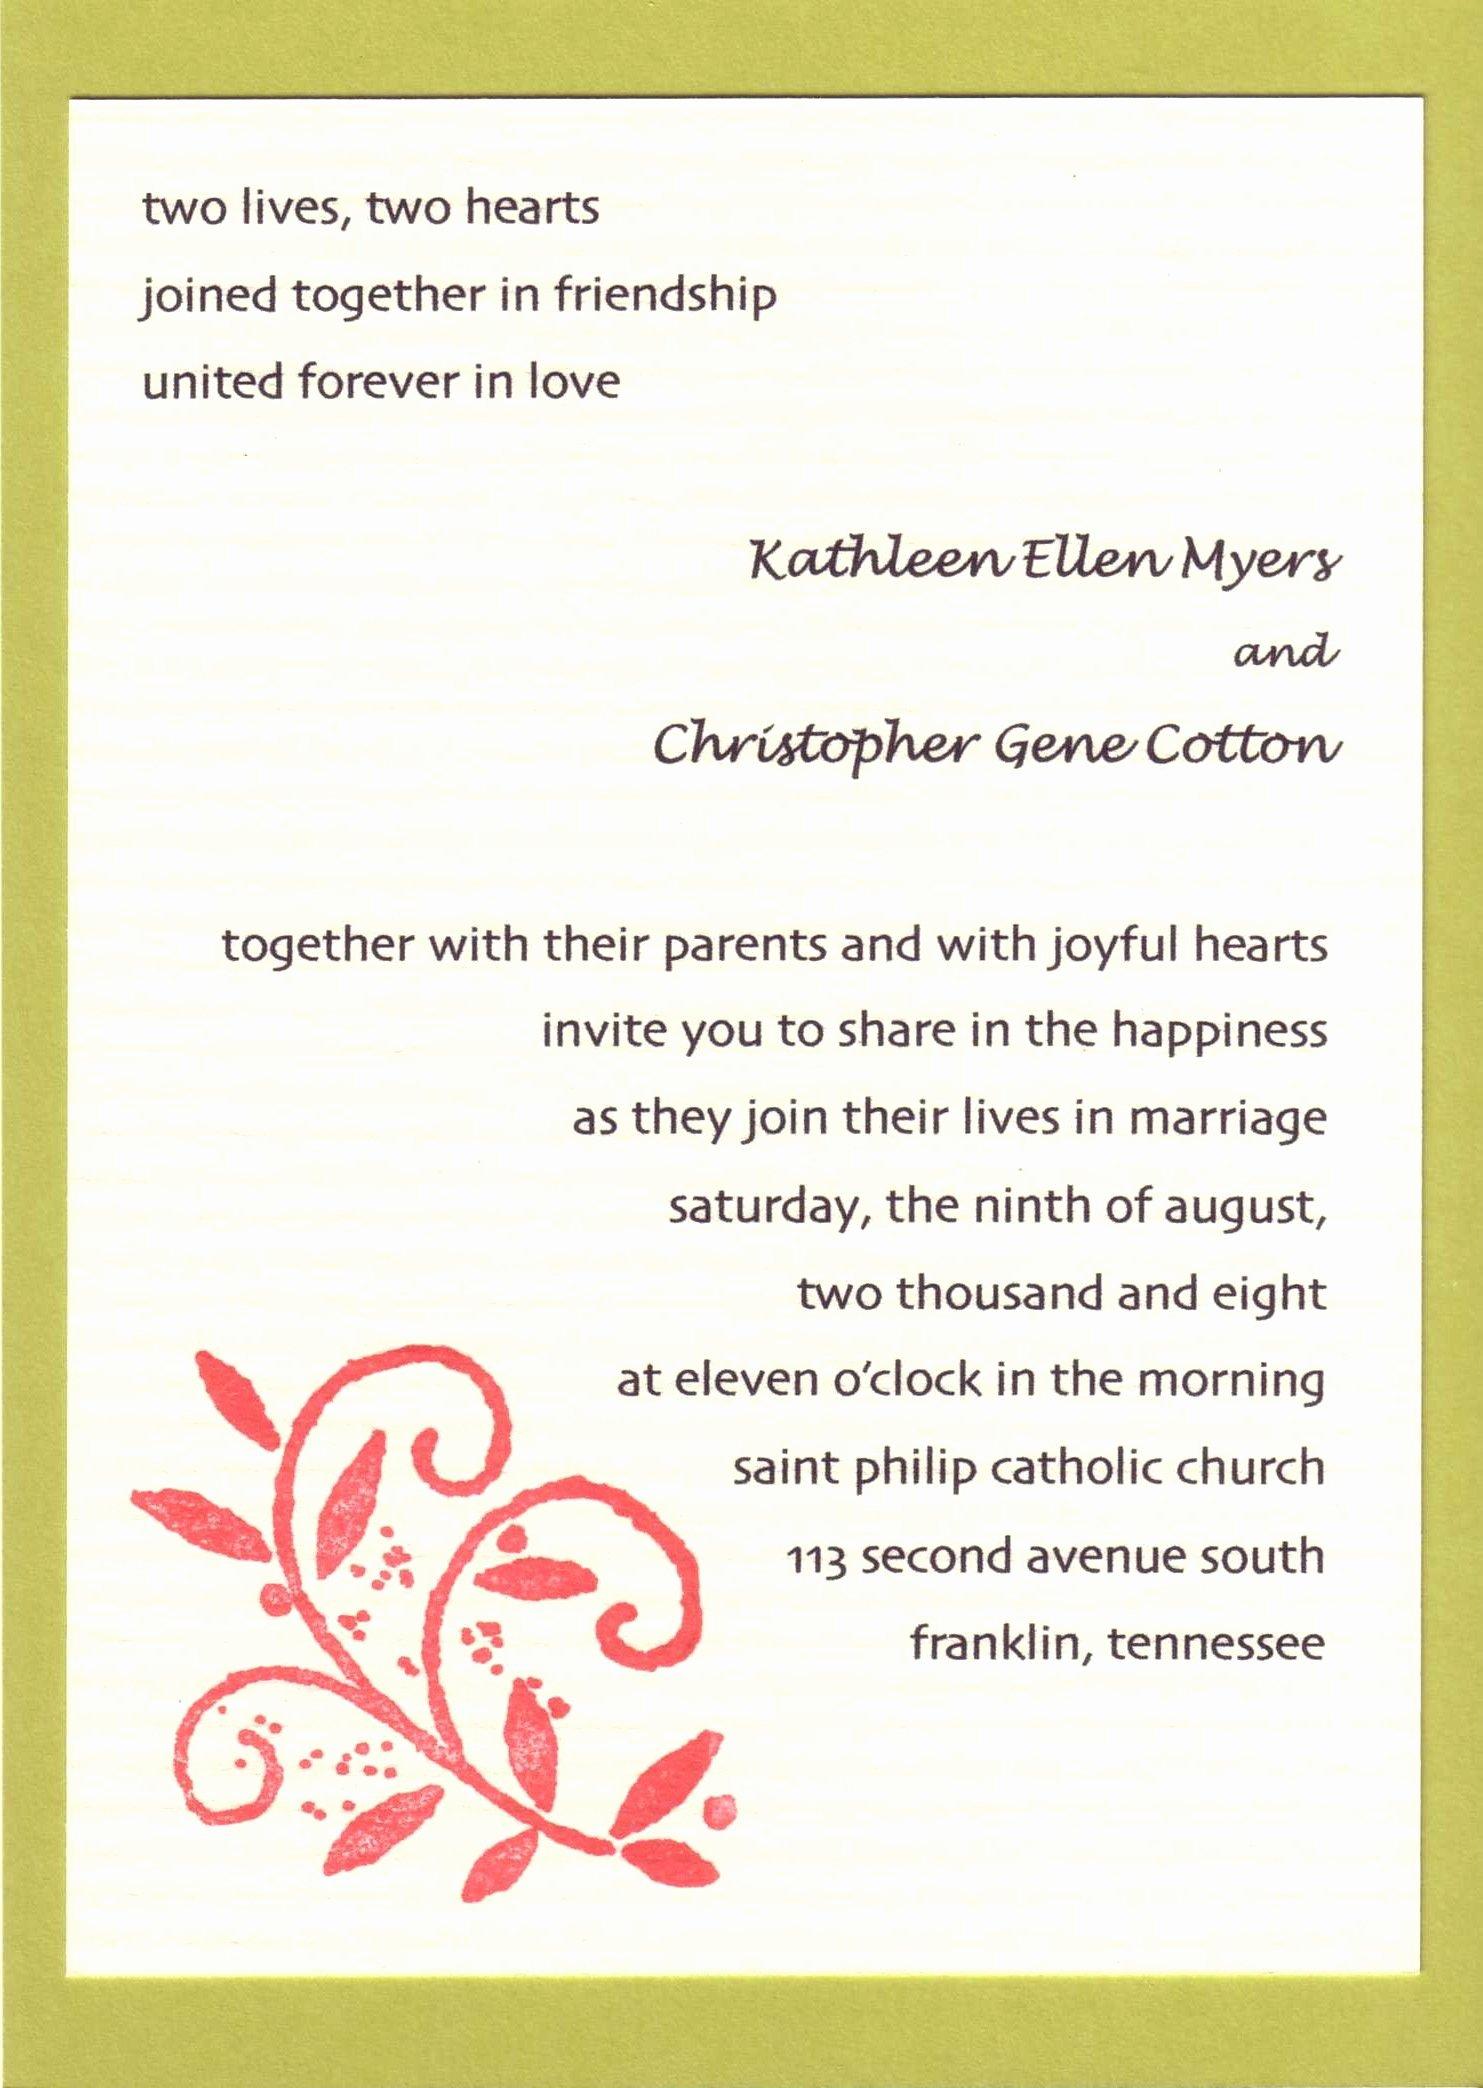 Memorial Service Invitation Template Beautiful Memorial Service Announcement Template